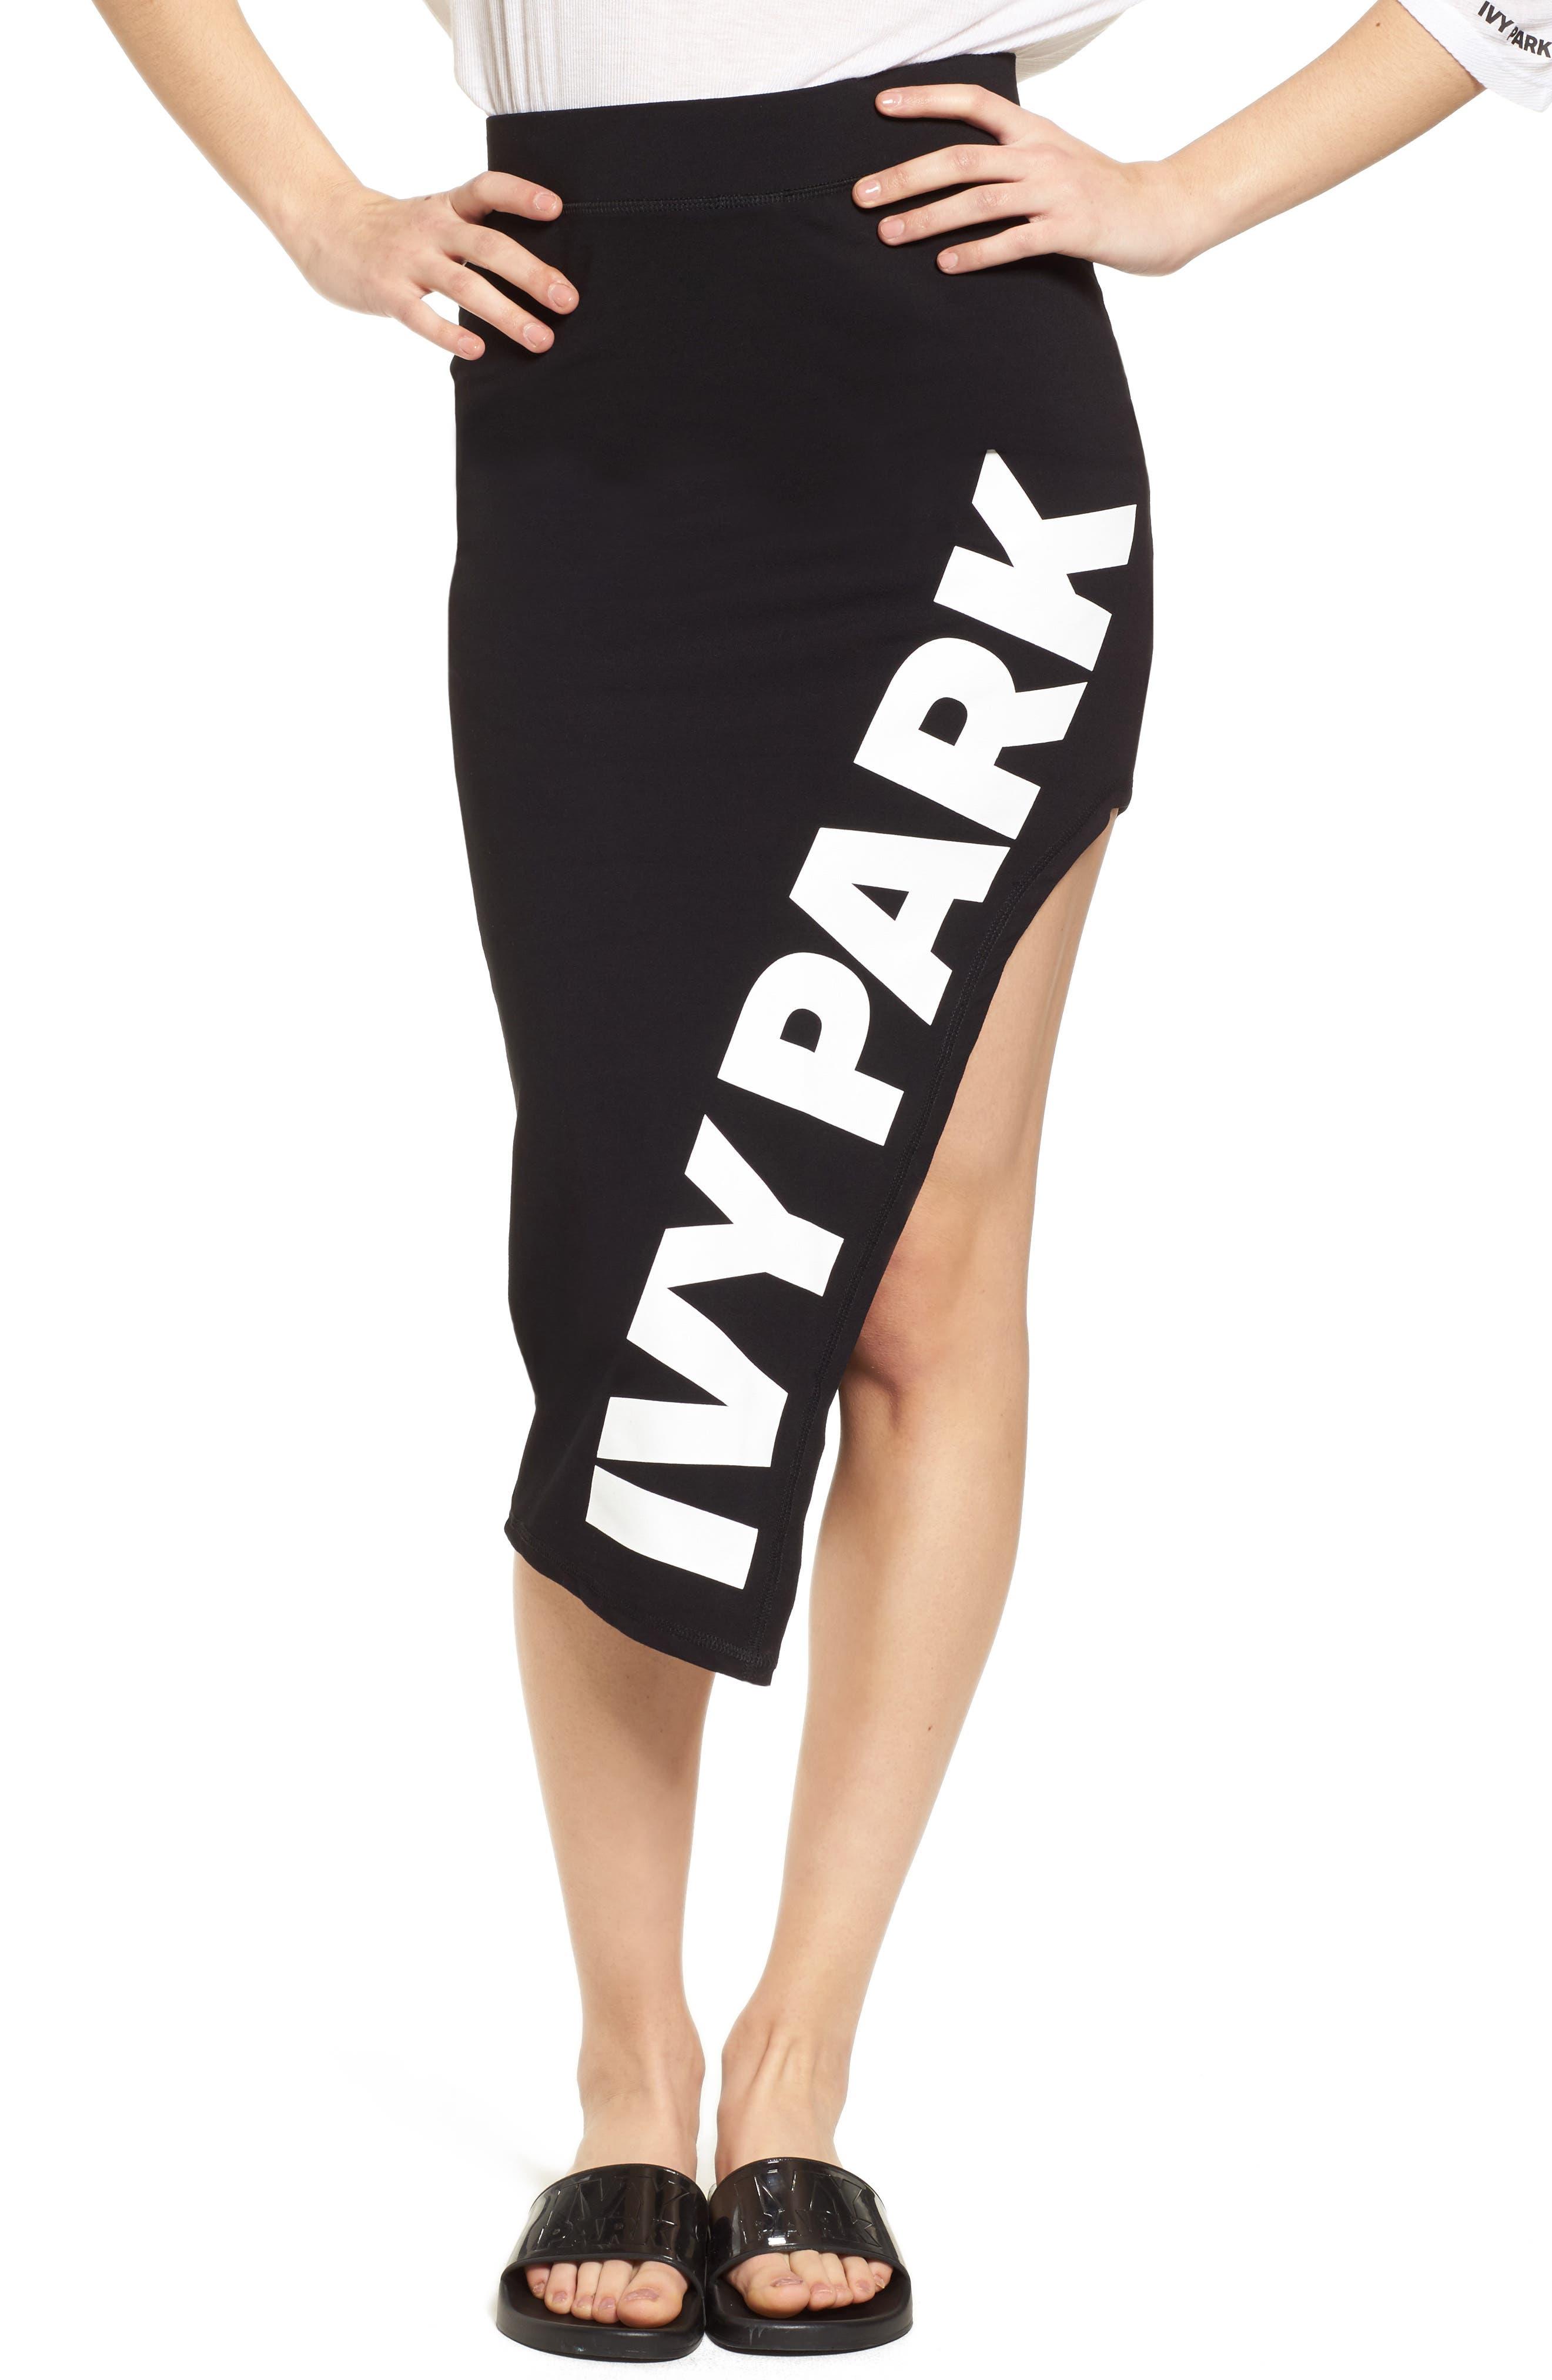 Main Image - IVY PARK® Logo Cutaway Side Pencil Skirt